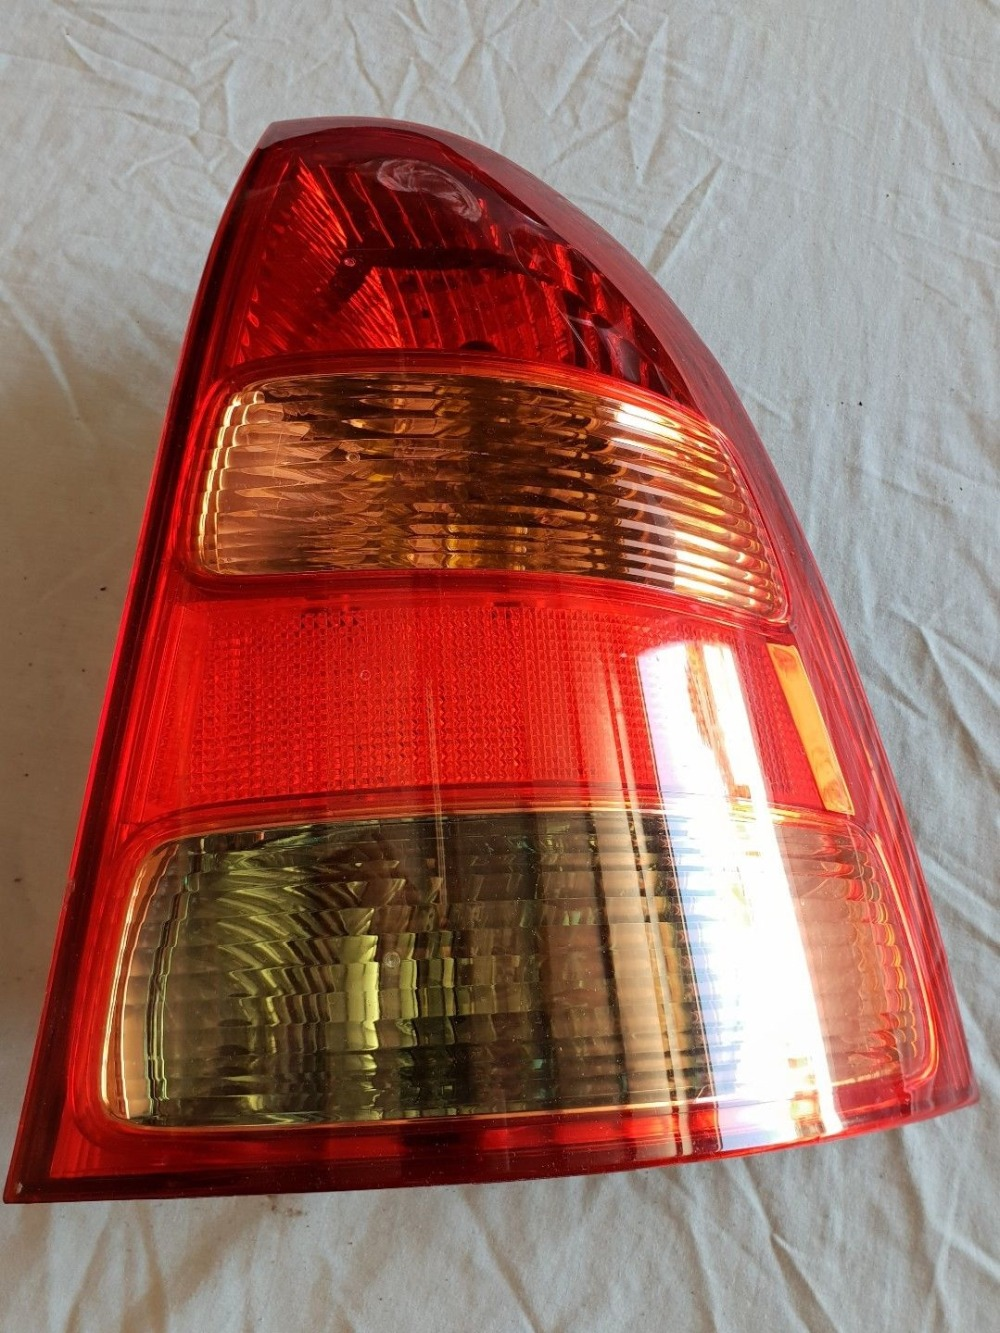 2002 toyotum celica tail light problem [ 1000 x 1333 Pixel ]